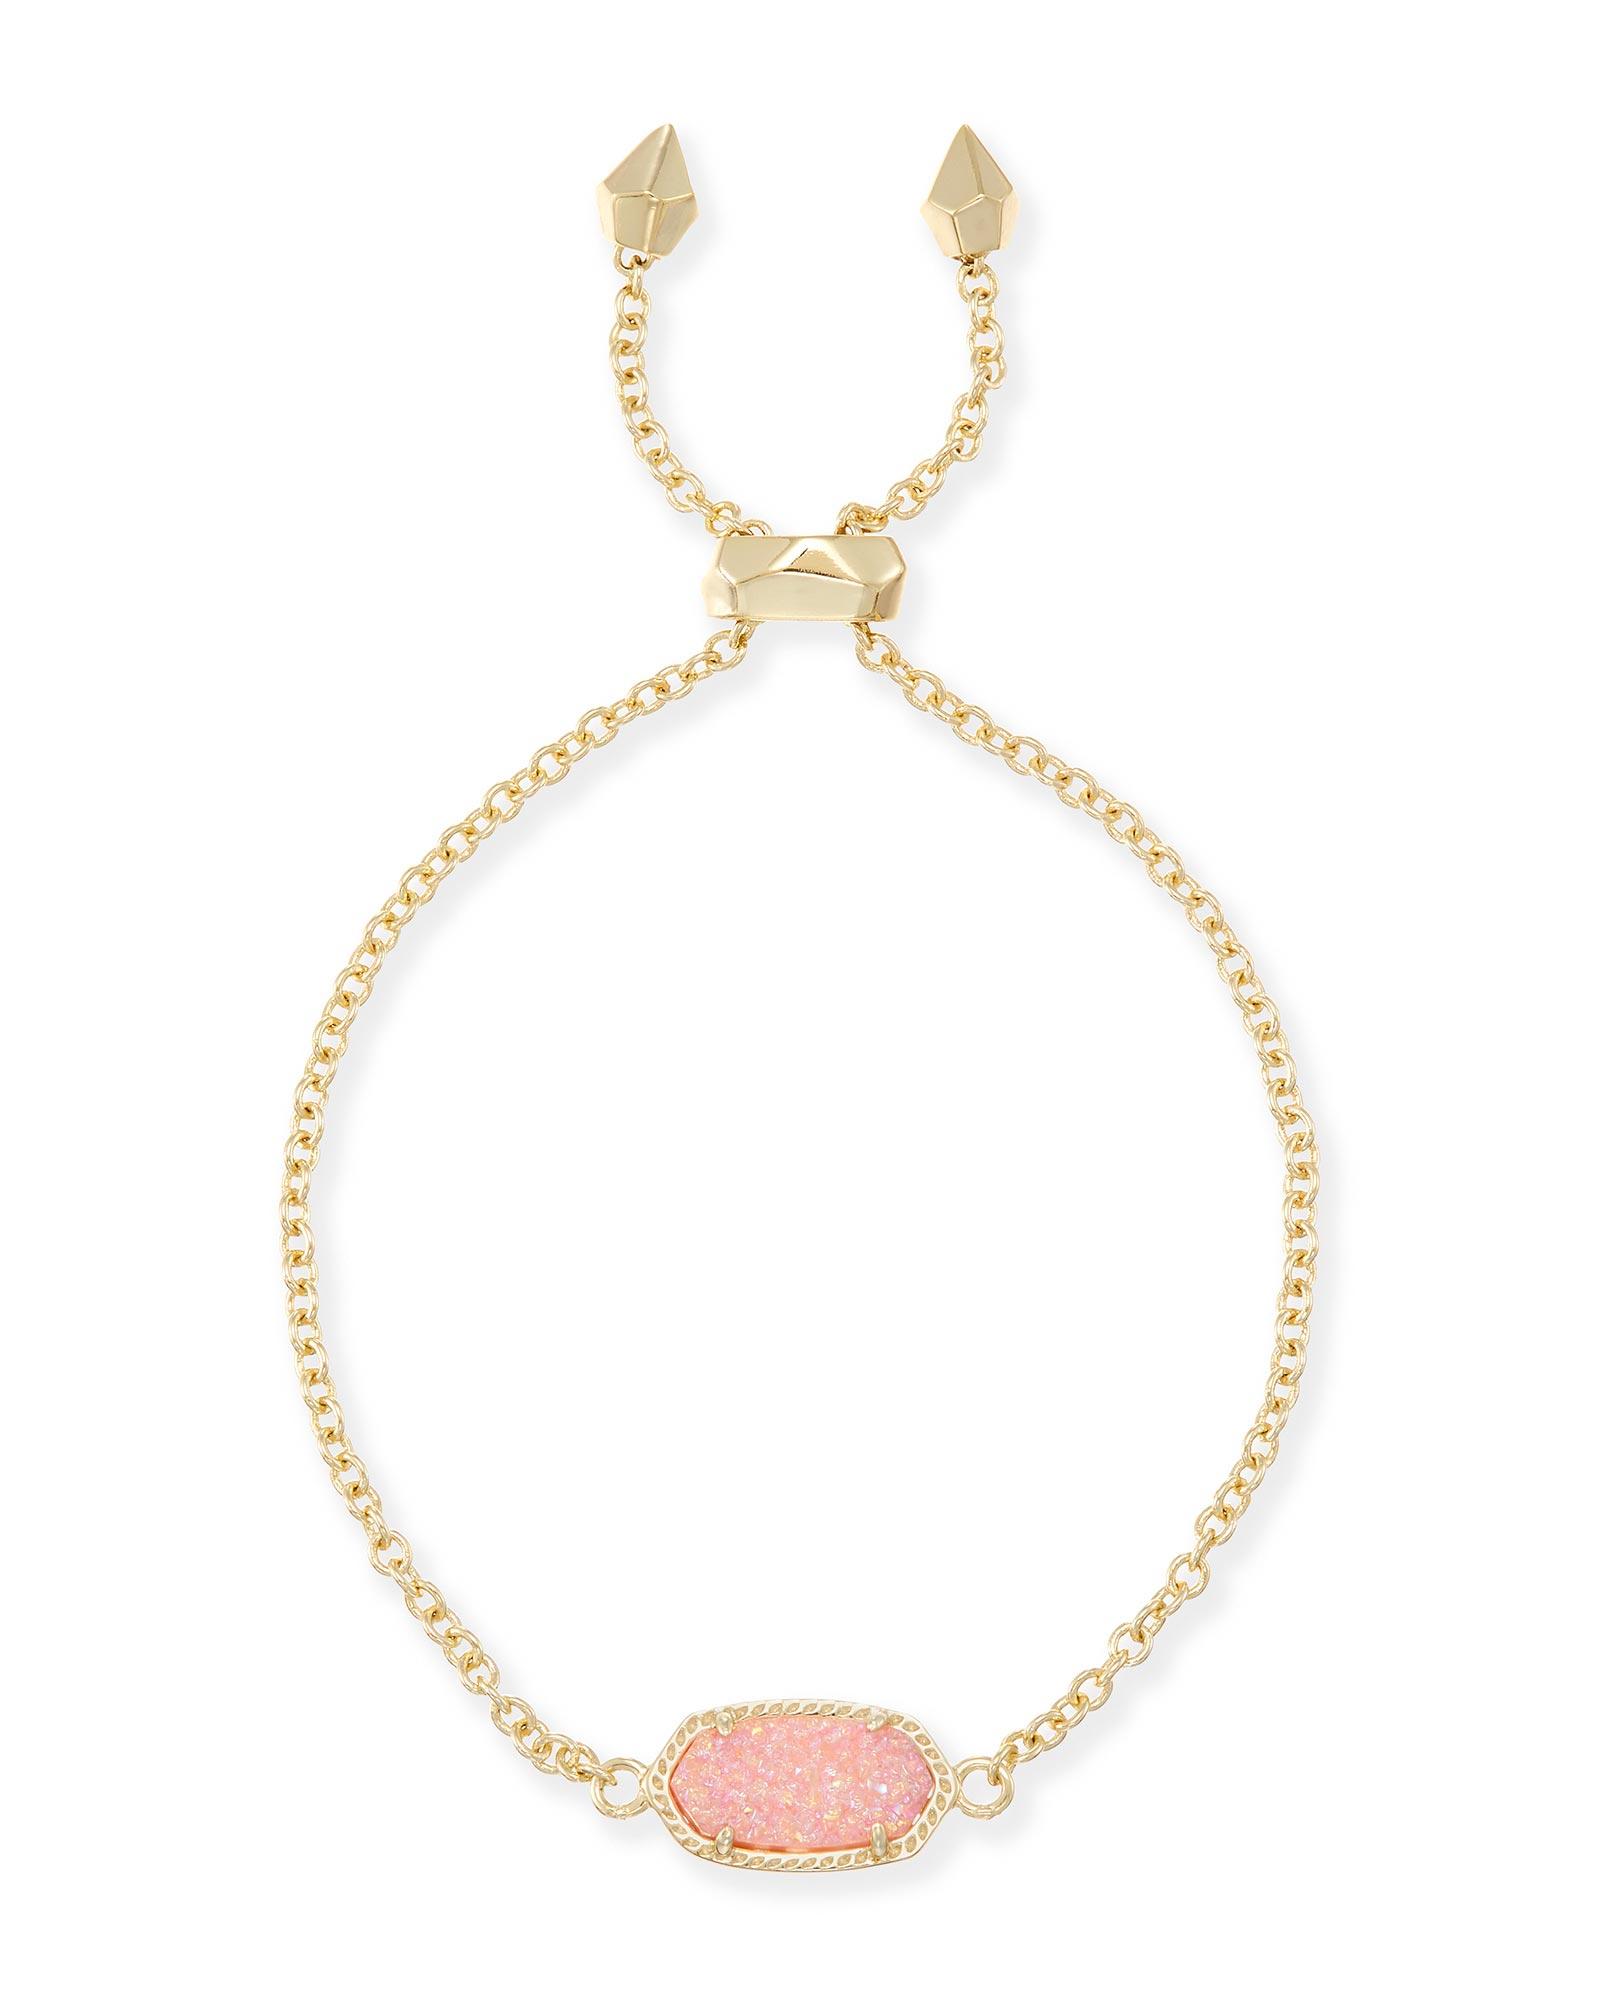 New Kendra Elaina Gold Adjustable Chain Bracelet In Rose Quartz